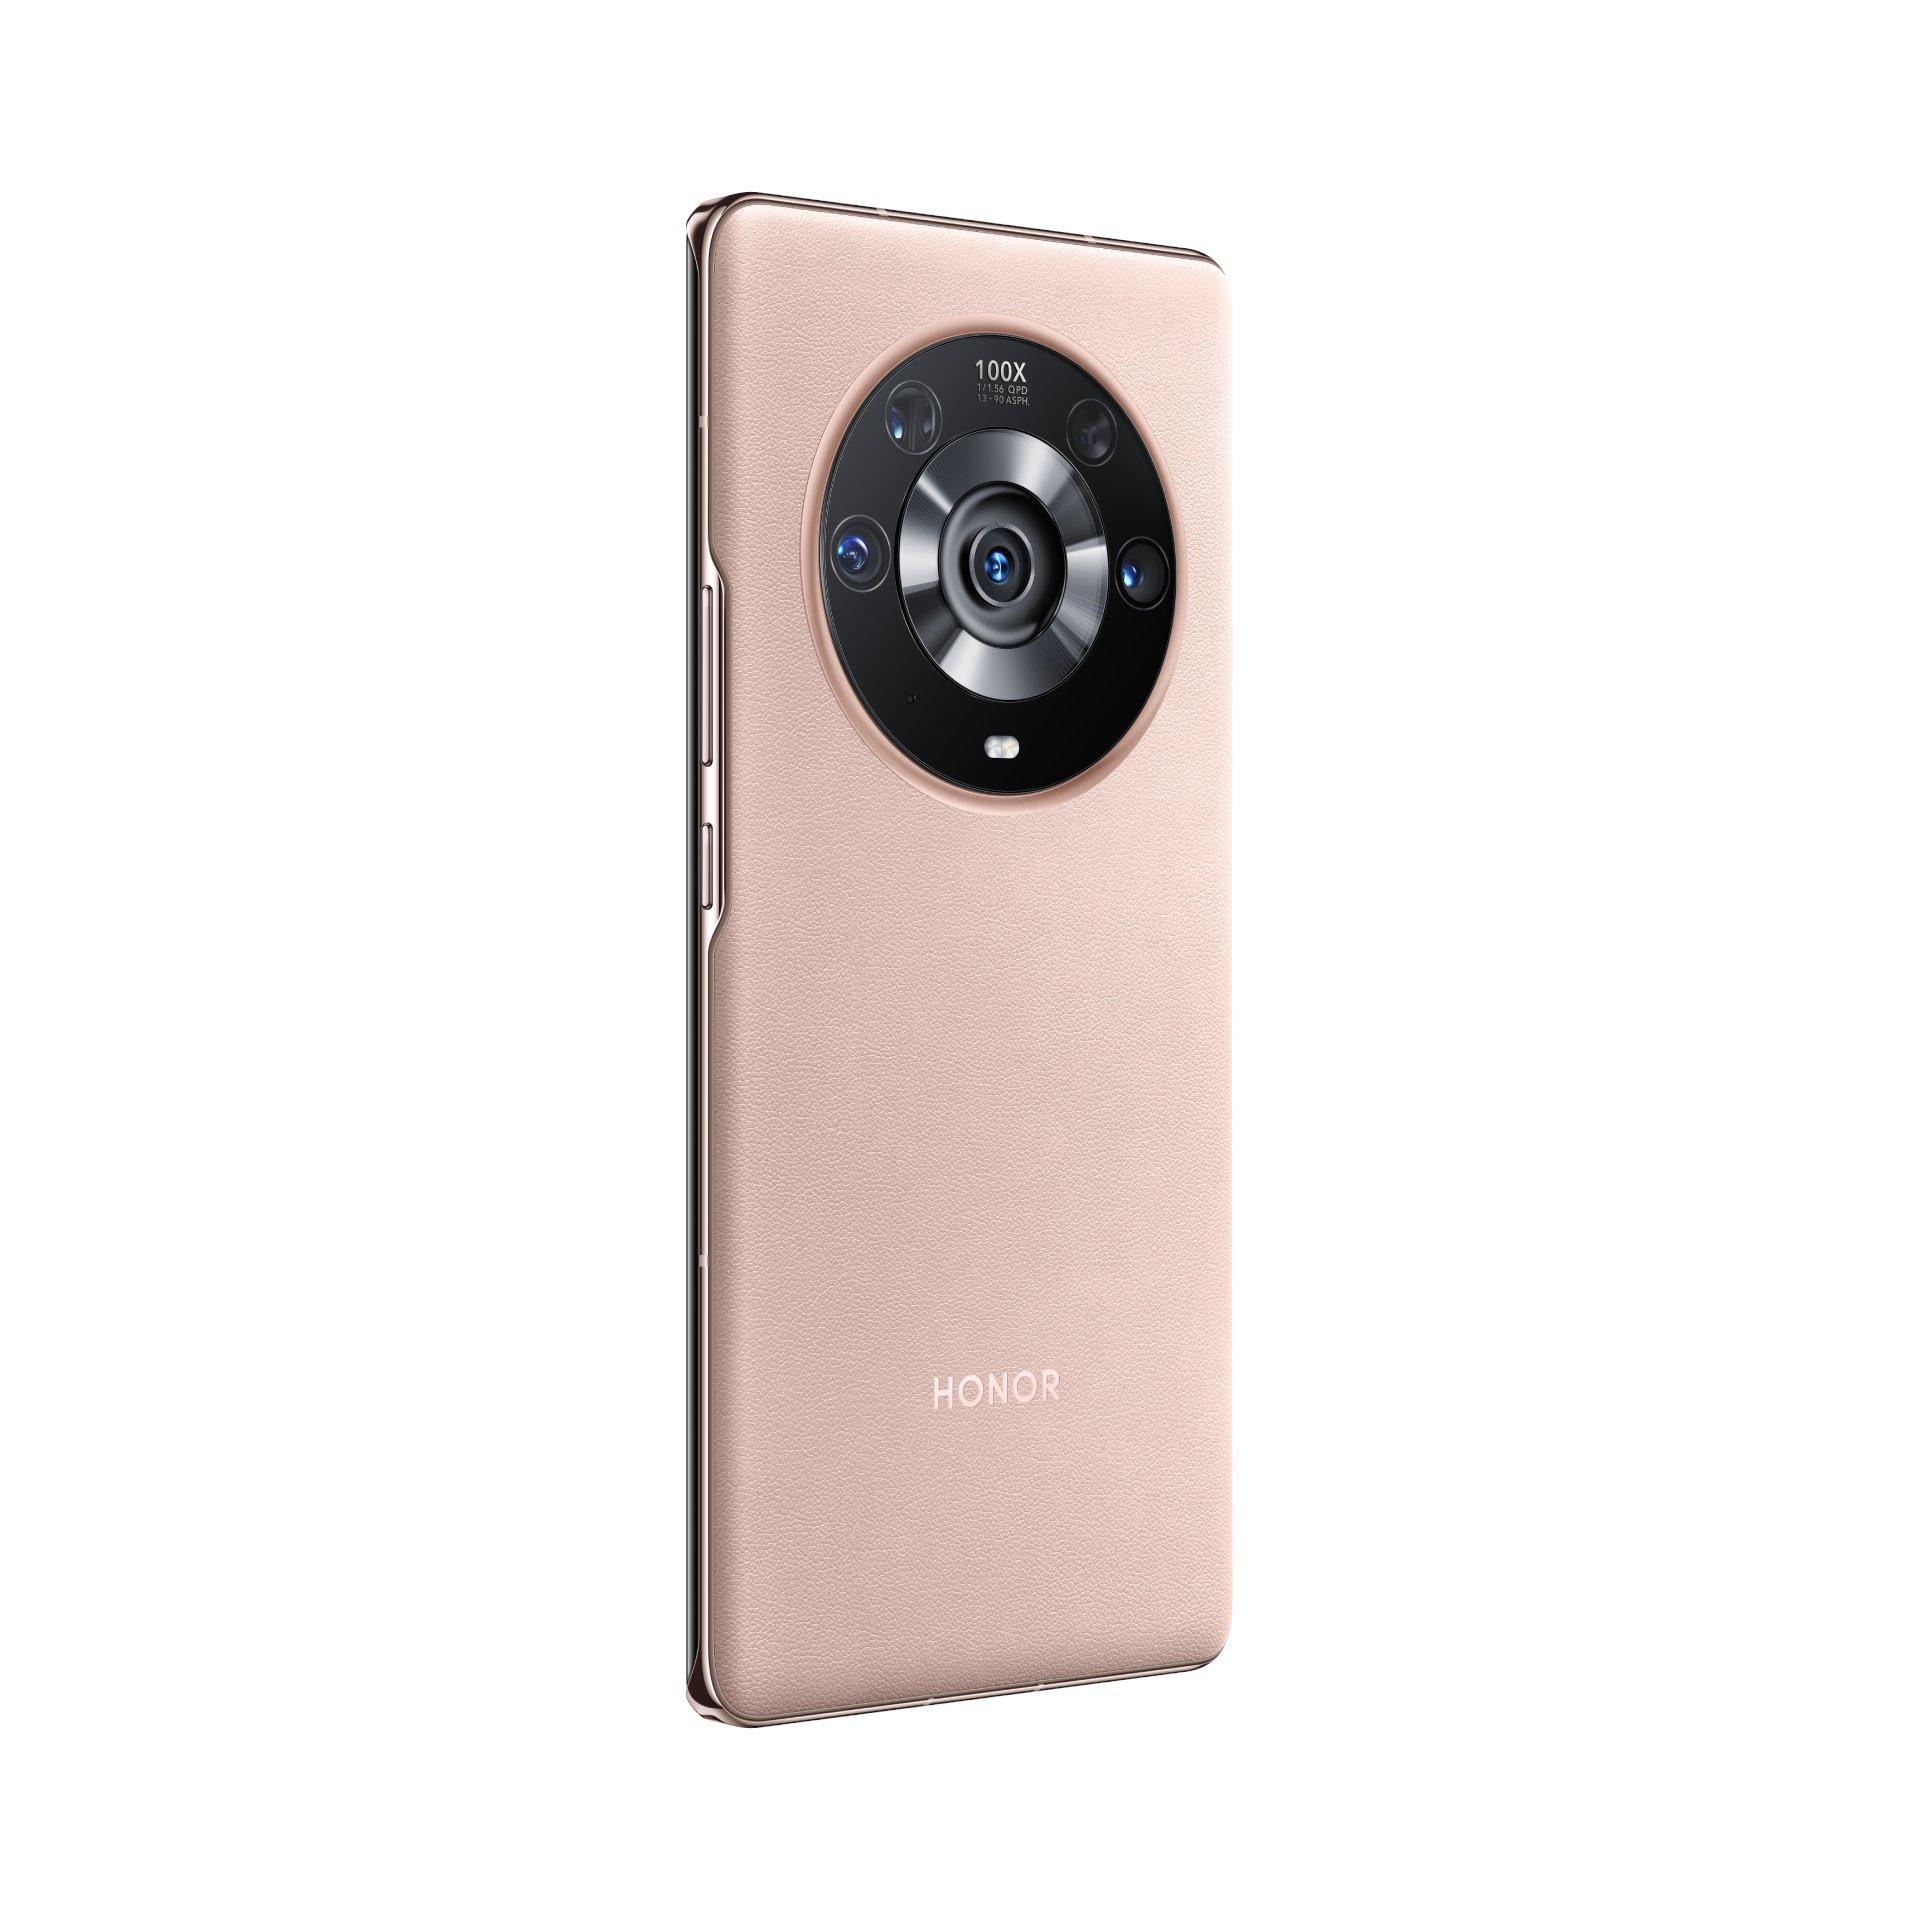 Honor Magic 3 Series Camera Features